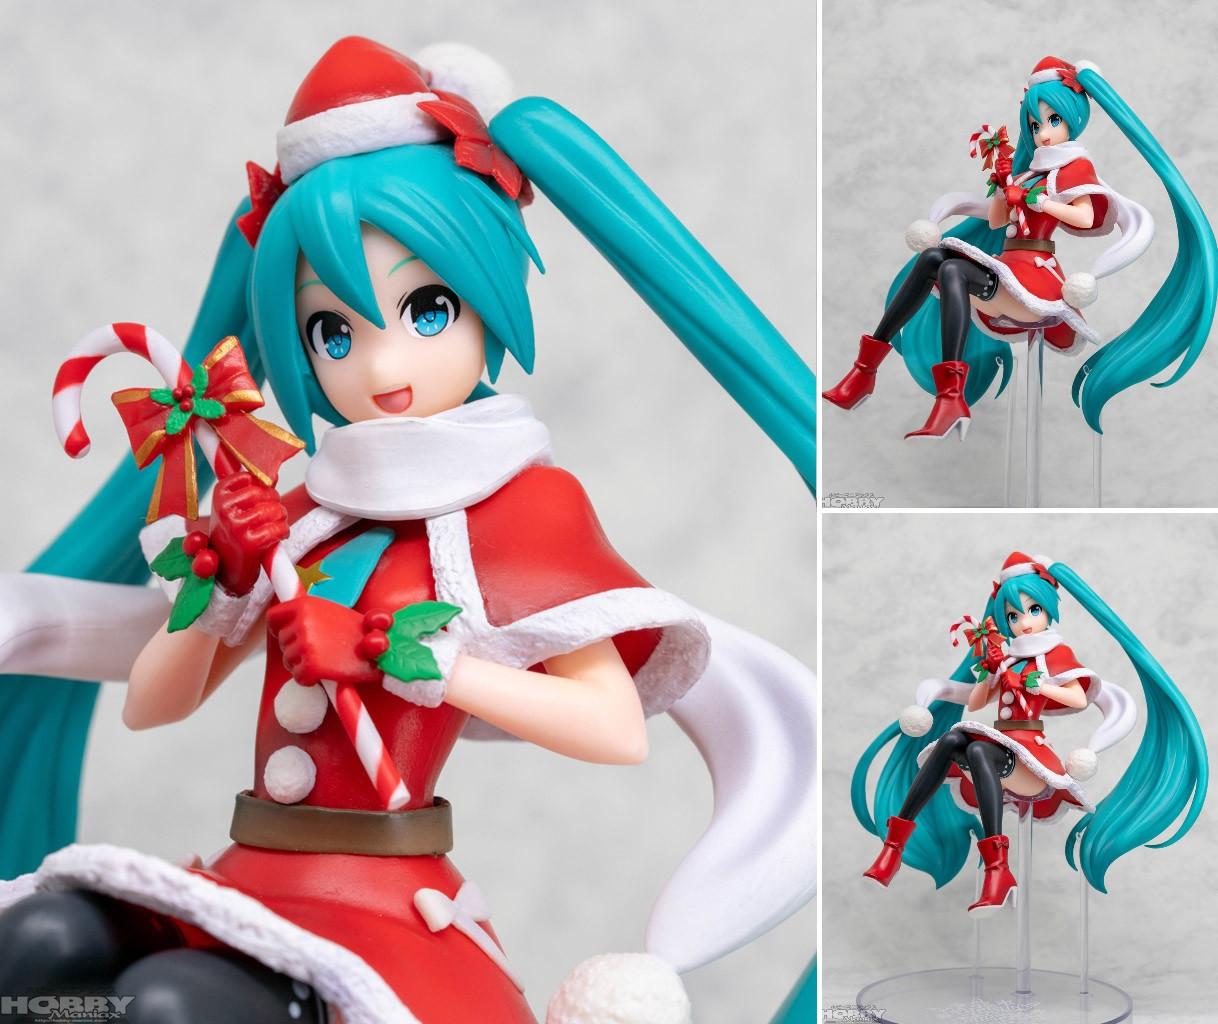 Hatsune Miku Christmas 2018.Super Premium Figure Hatsune Miku Christmas 2018 17cm